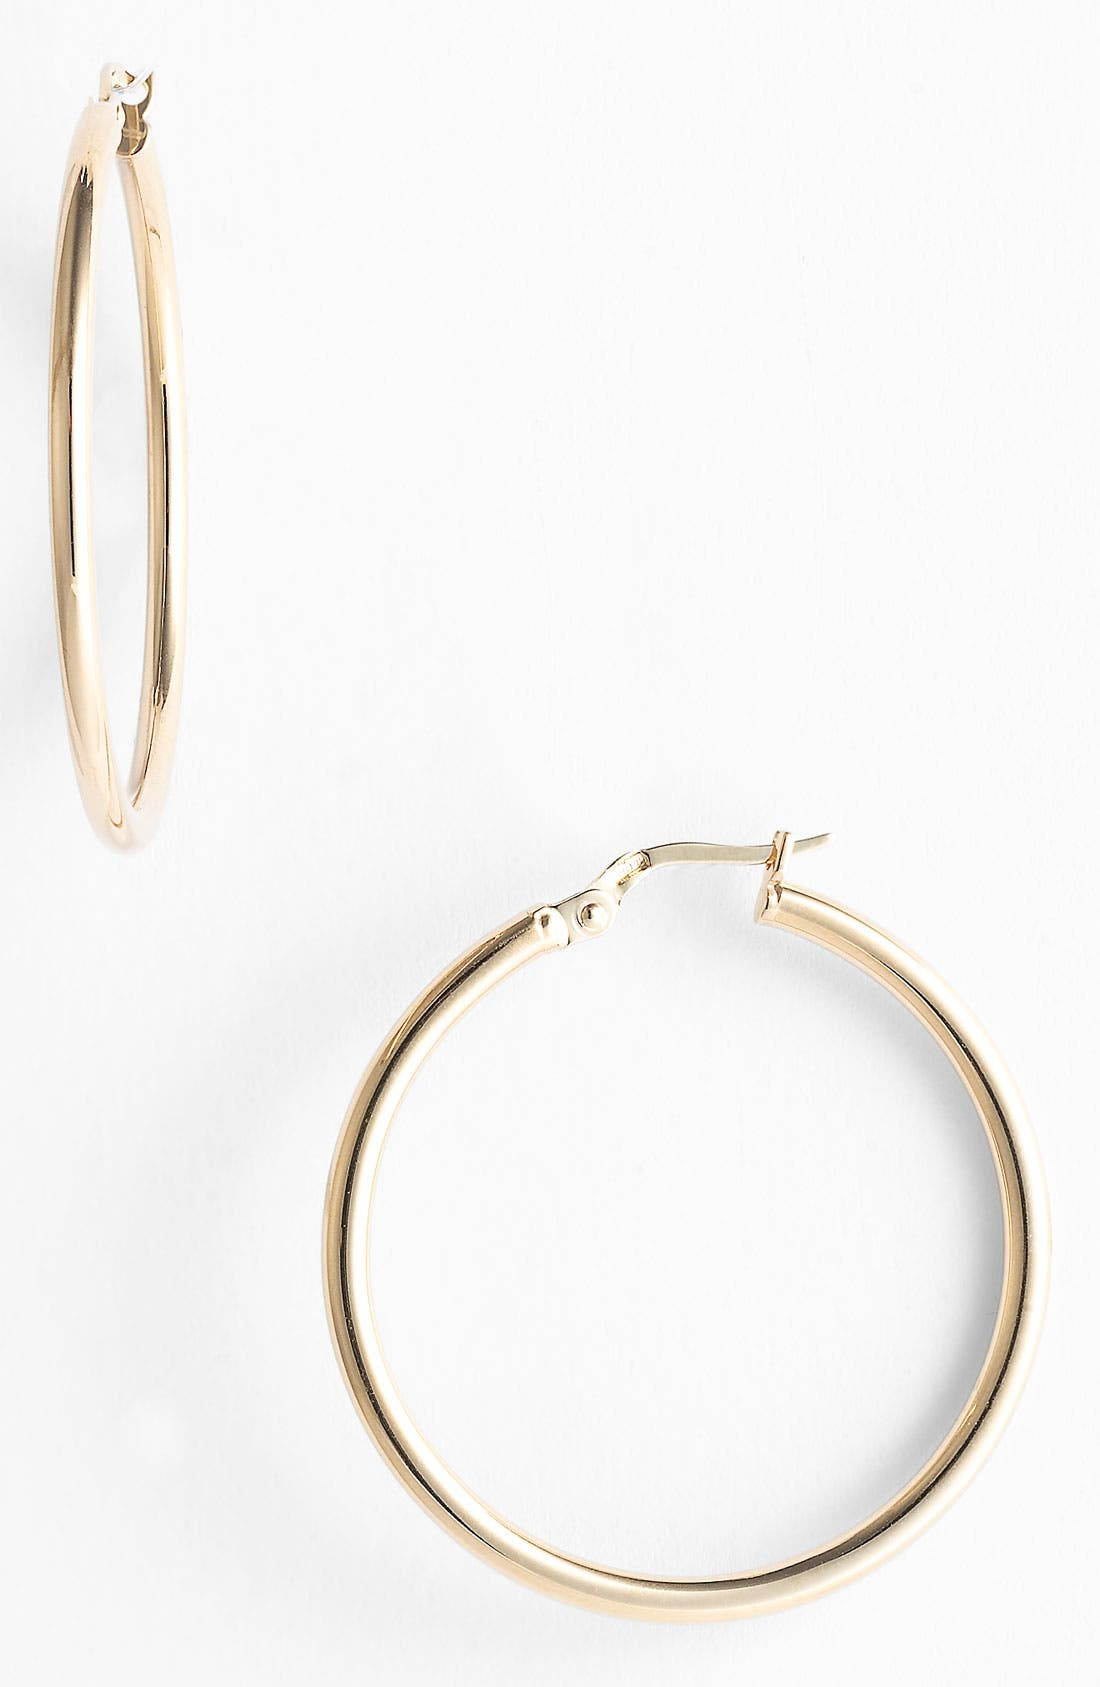 Main Image - Roberto Coin 35mm Gold Hoop Earrings